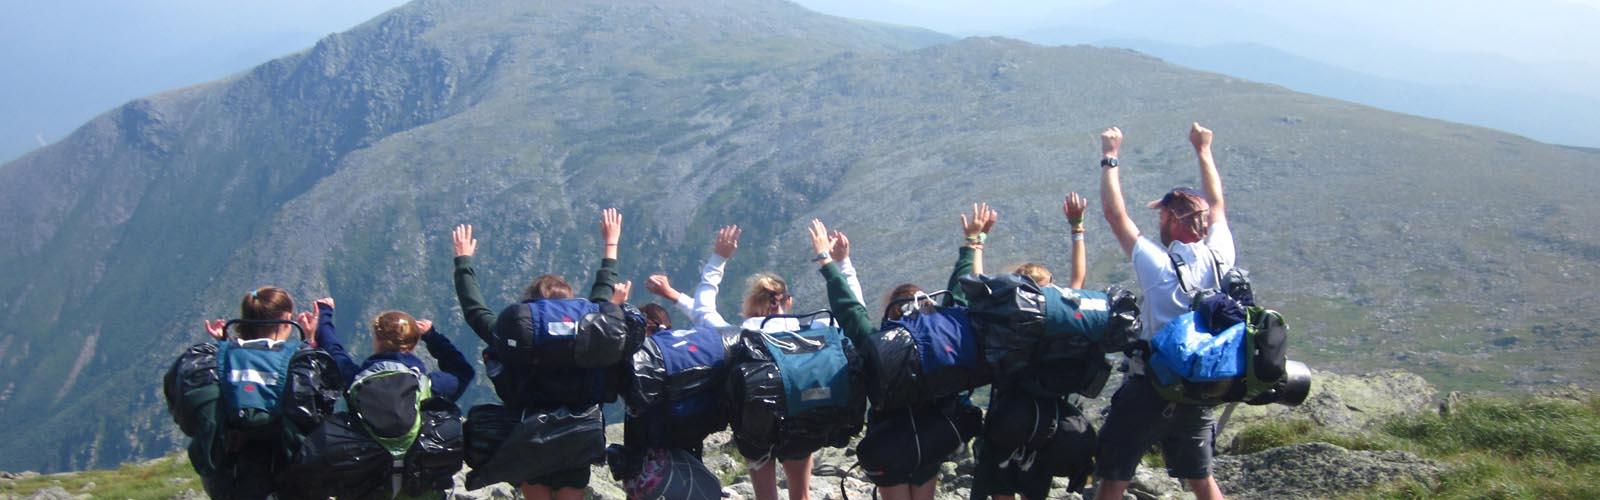 wide_hiker_mountain_sm